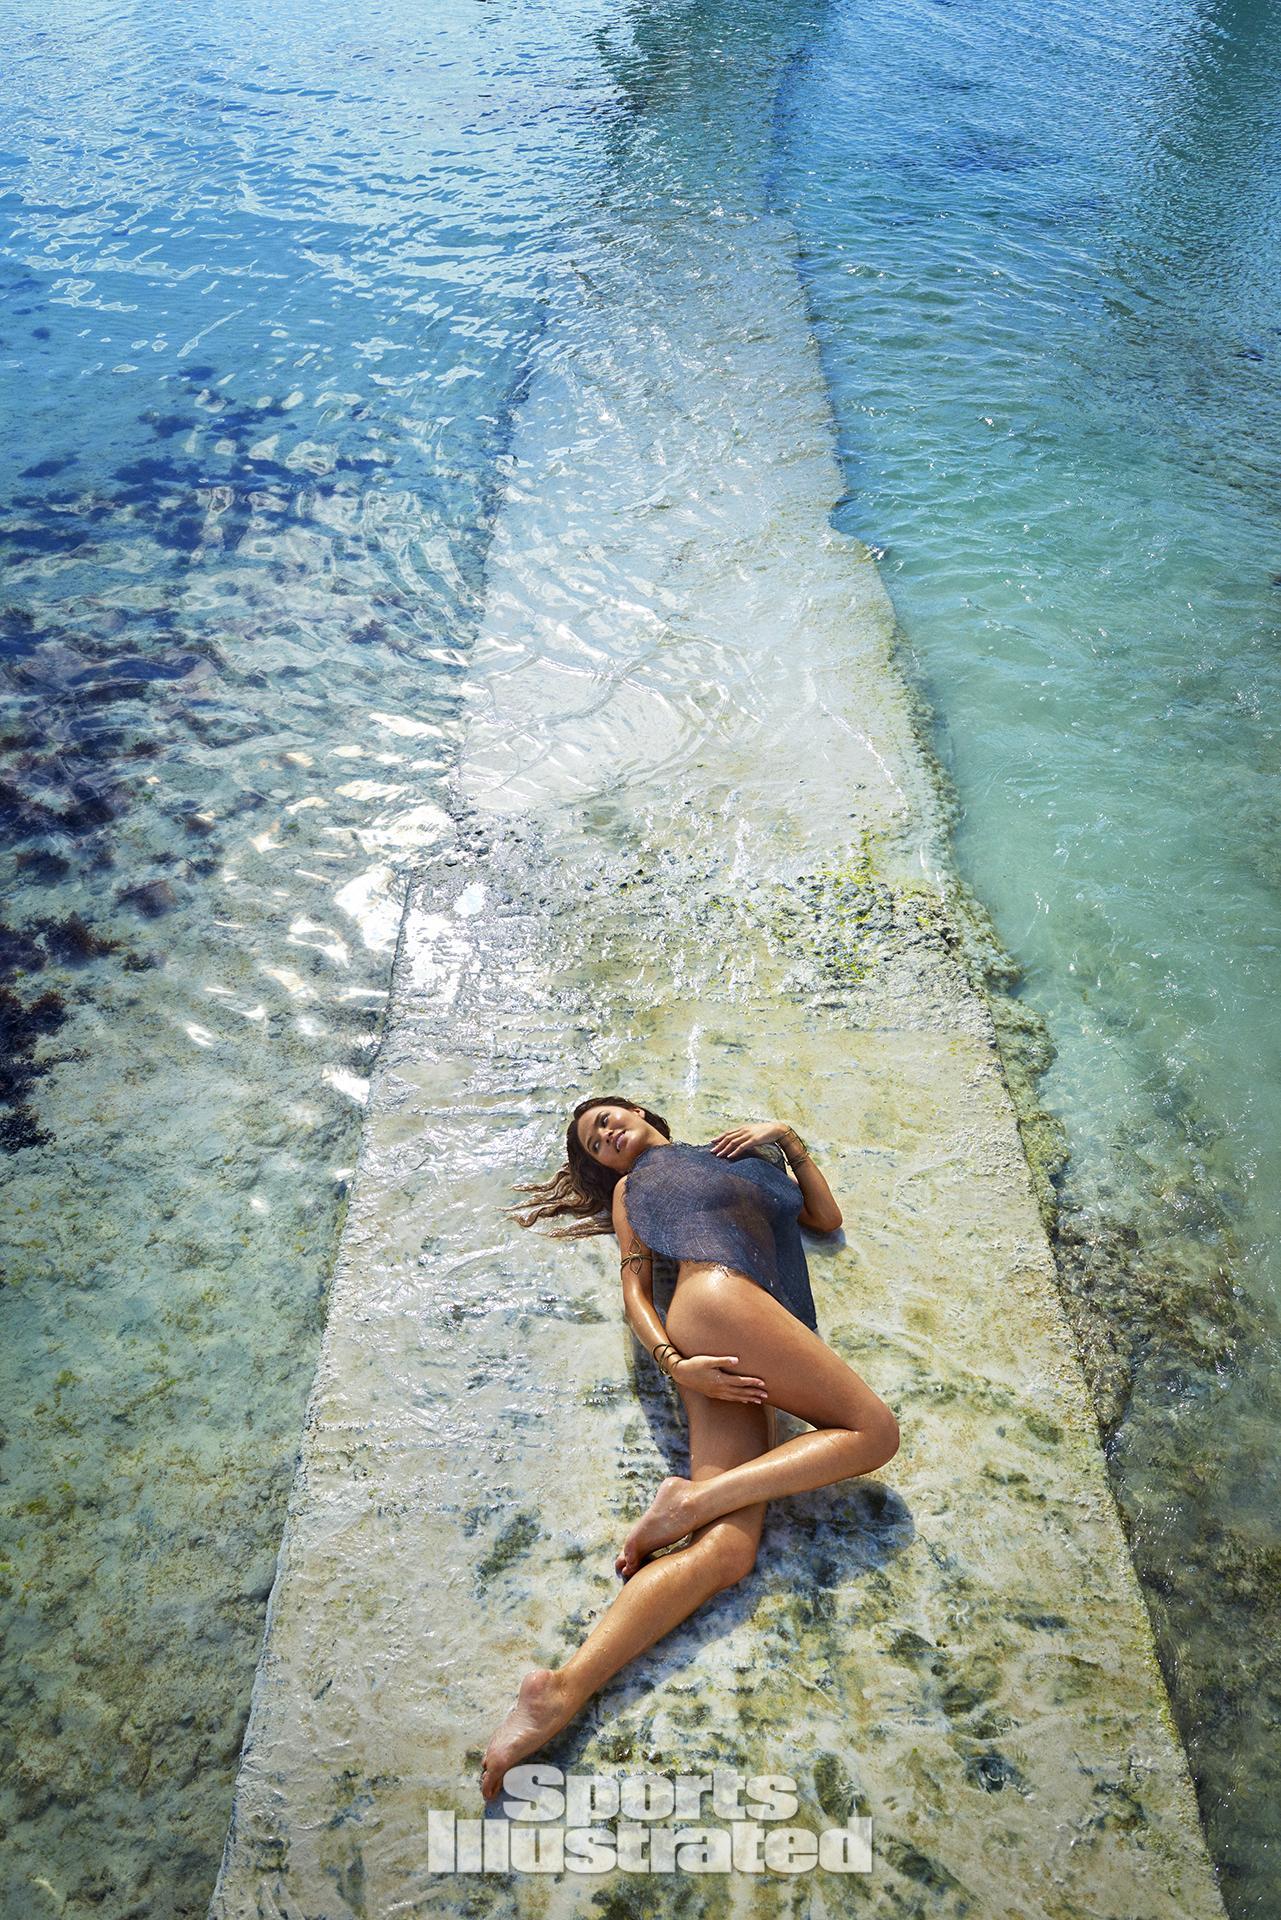 Chrissy Teigen - Sports Illustrated Swimsuit 2016